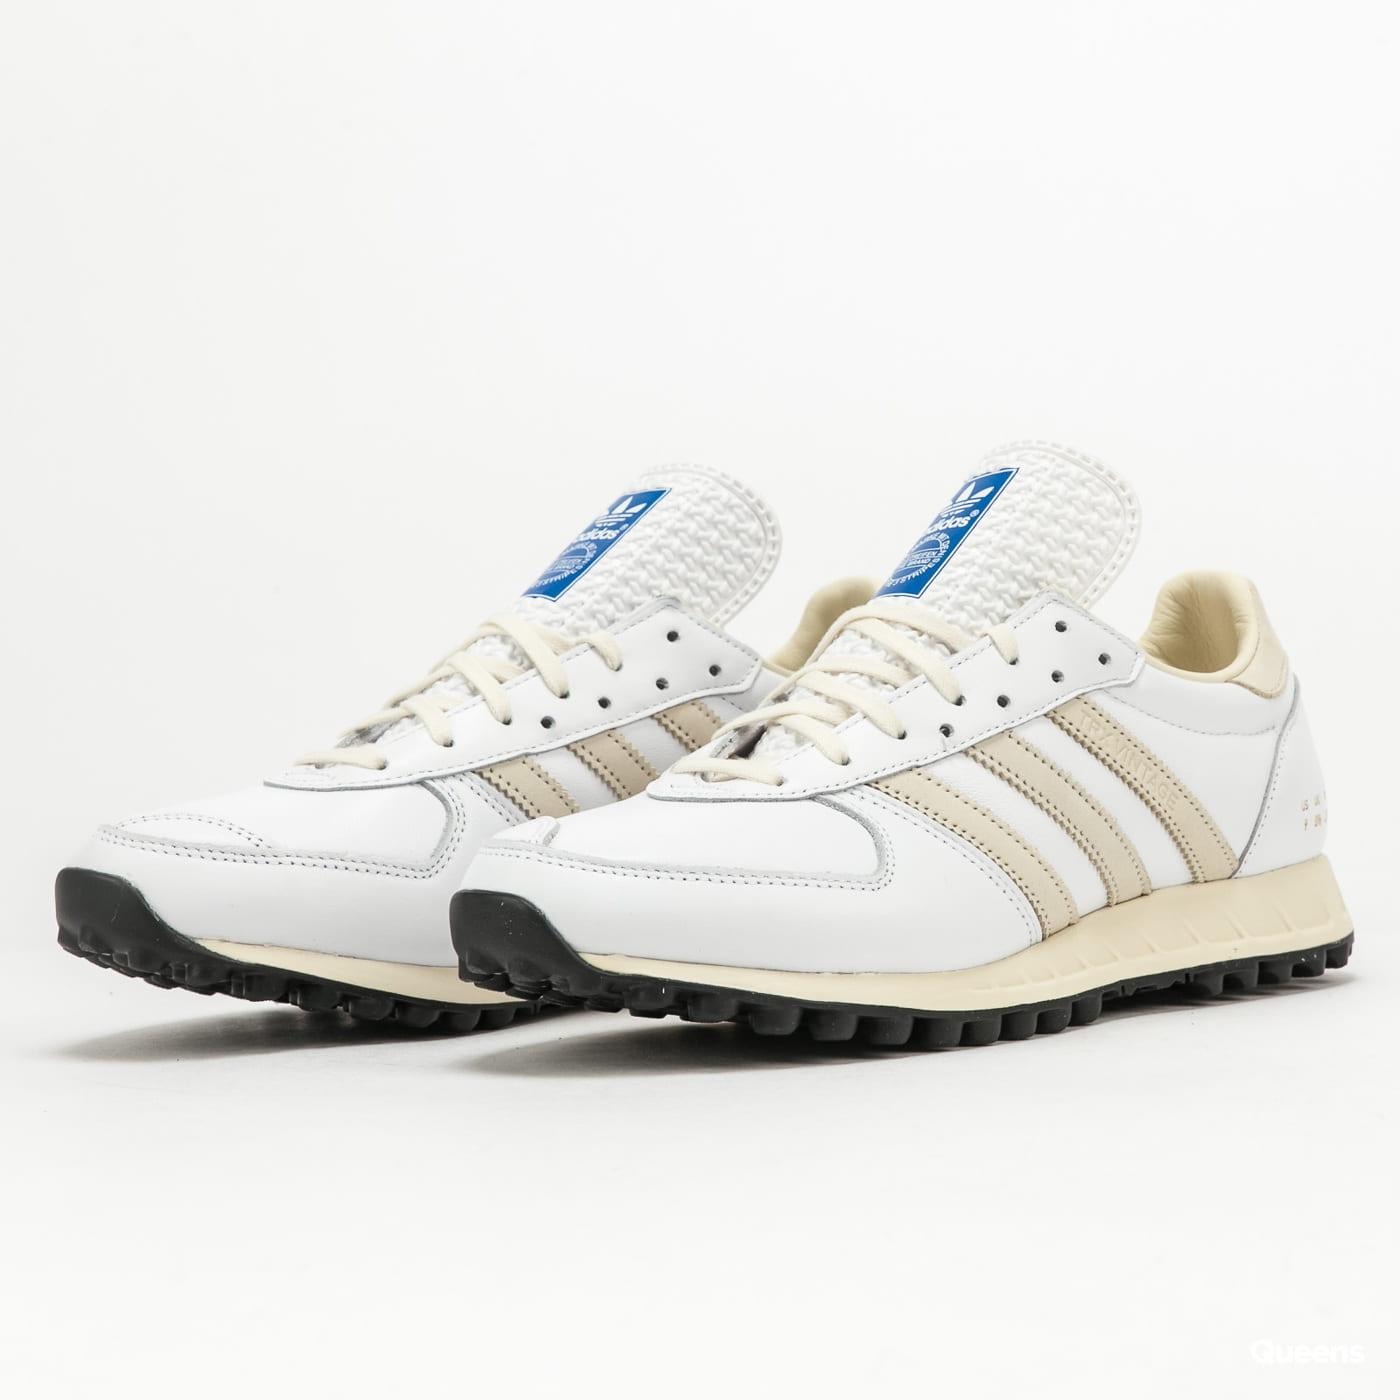 adidas Originals Adidas TRX Vintage ftwwht / cwhite / cblack